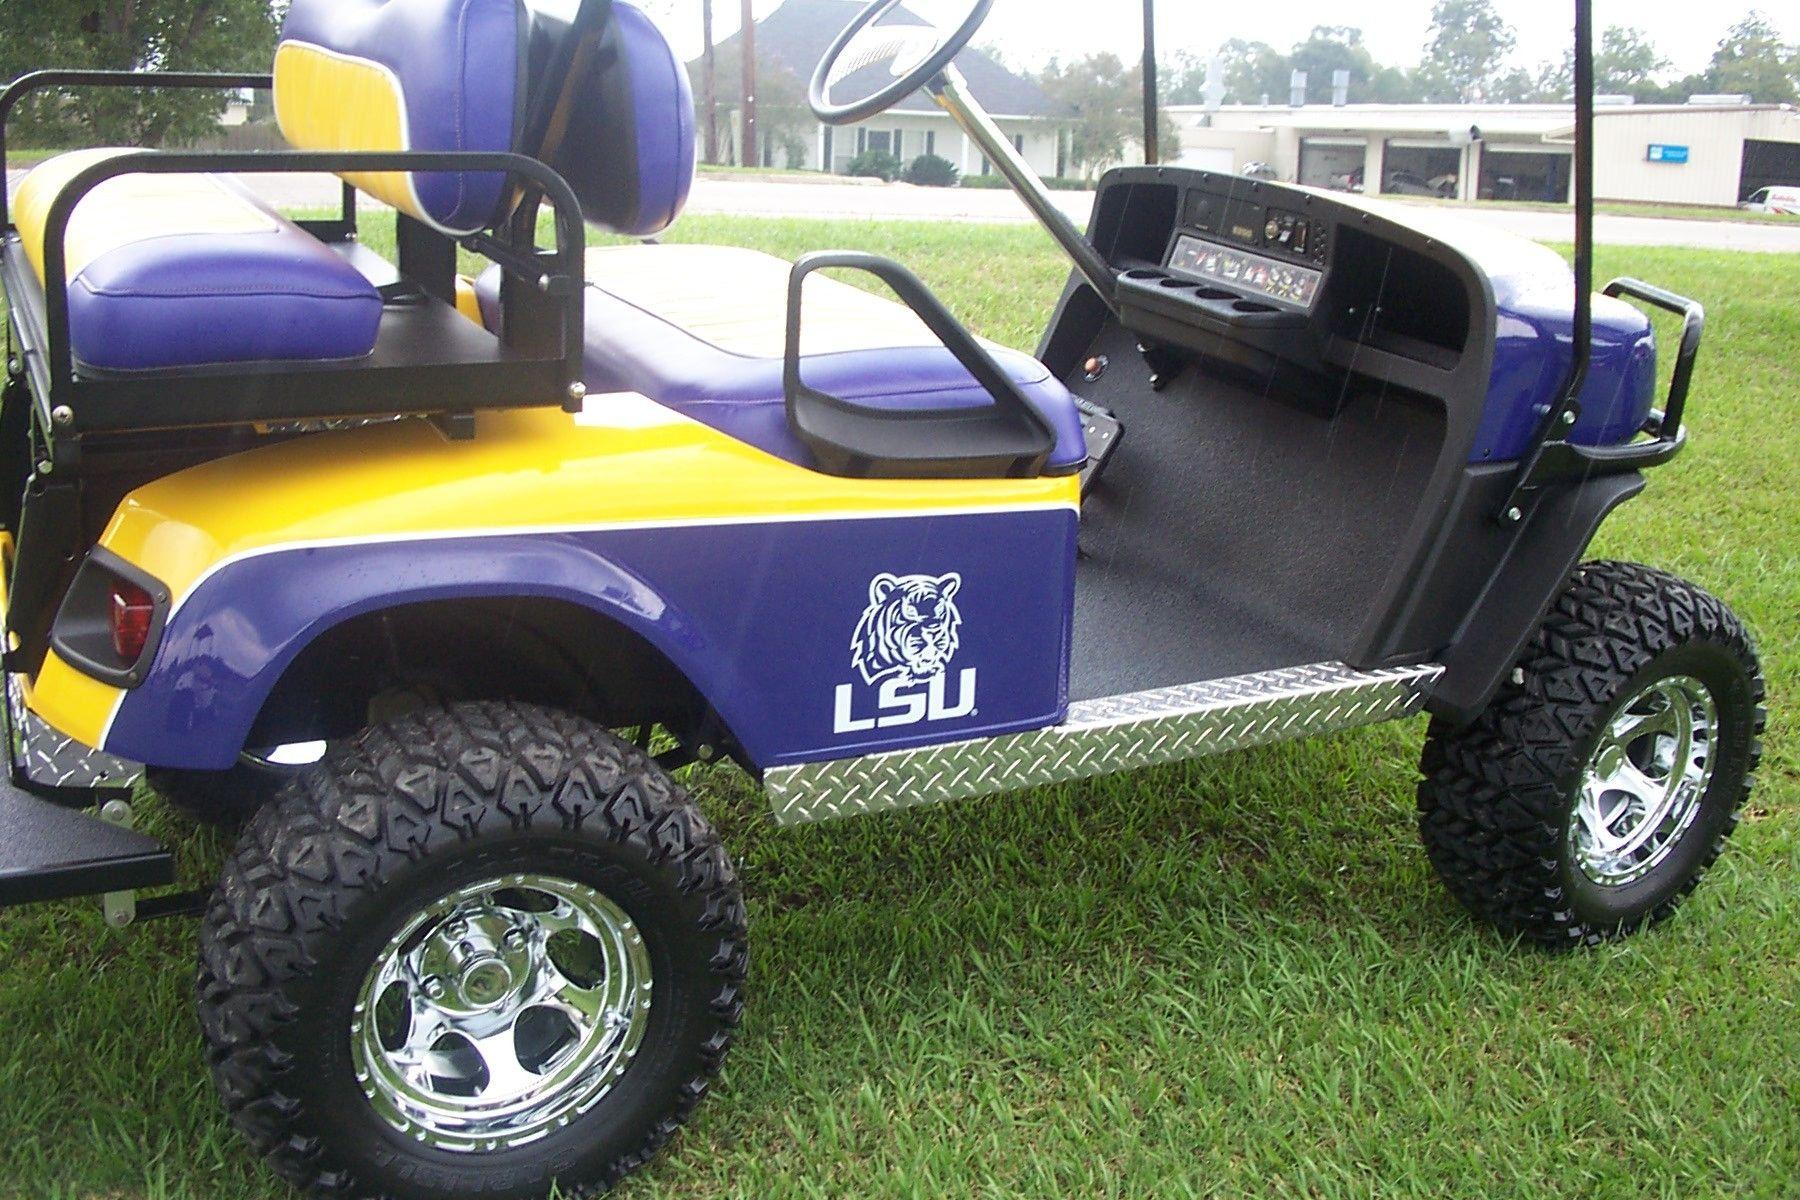 Handmade Lsu Golf Cart by Bayou Boogie Customs | CustomMade.com on uva golf cart seats, el tigre golf cart seats, columbia golf cart seats, brown golf cart seats, mississippi state golf cart seats, steelers golf cart seats, alabama golf cart seats, michigan golf cart seats,